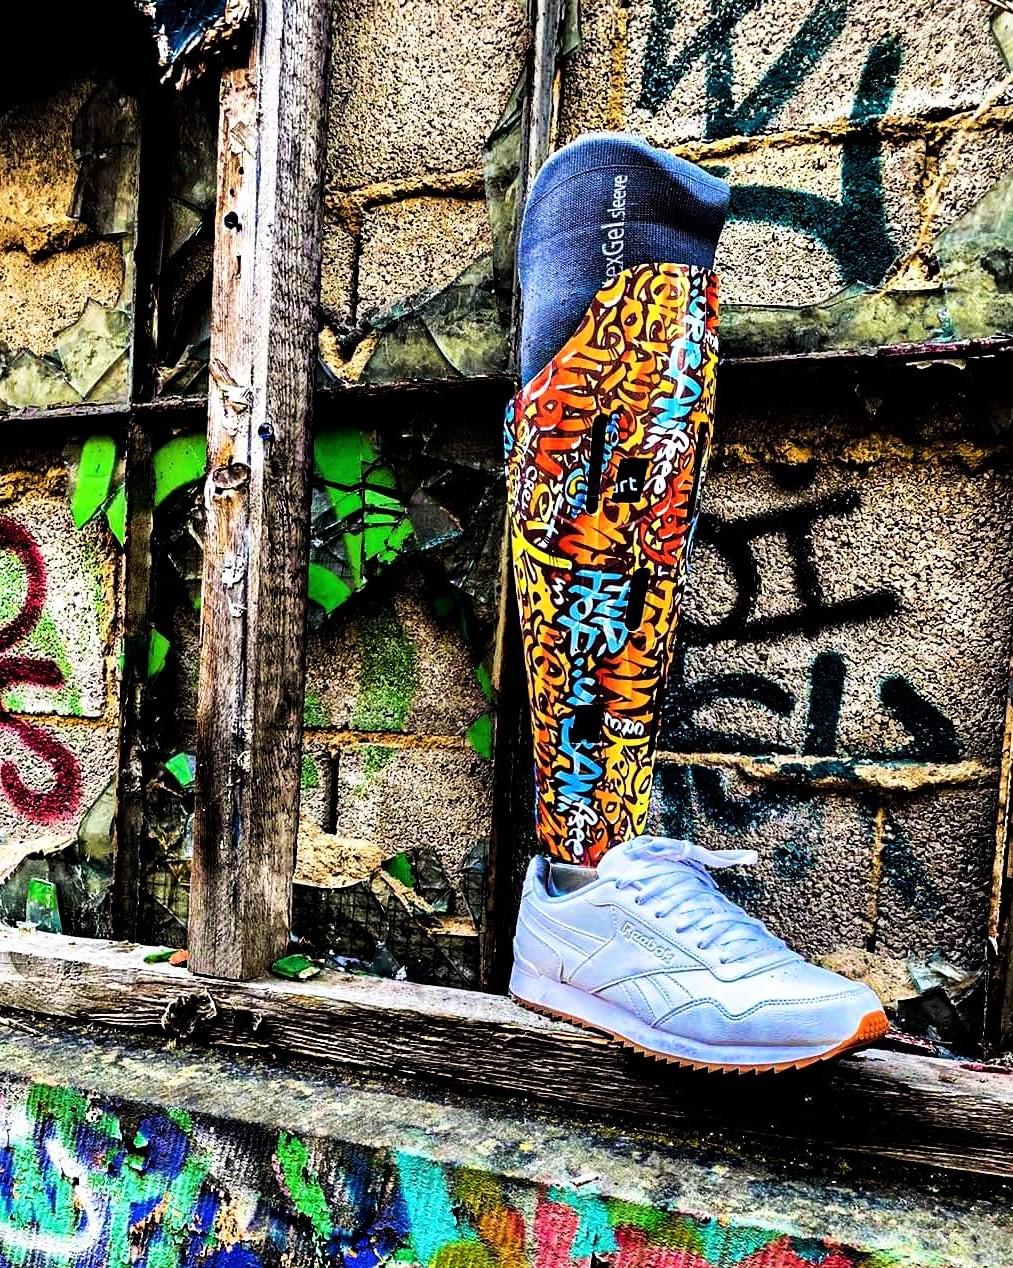 LIMB-art prosthetic leg cover graffiti hydrodip